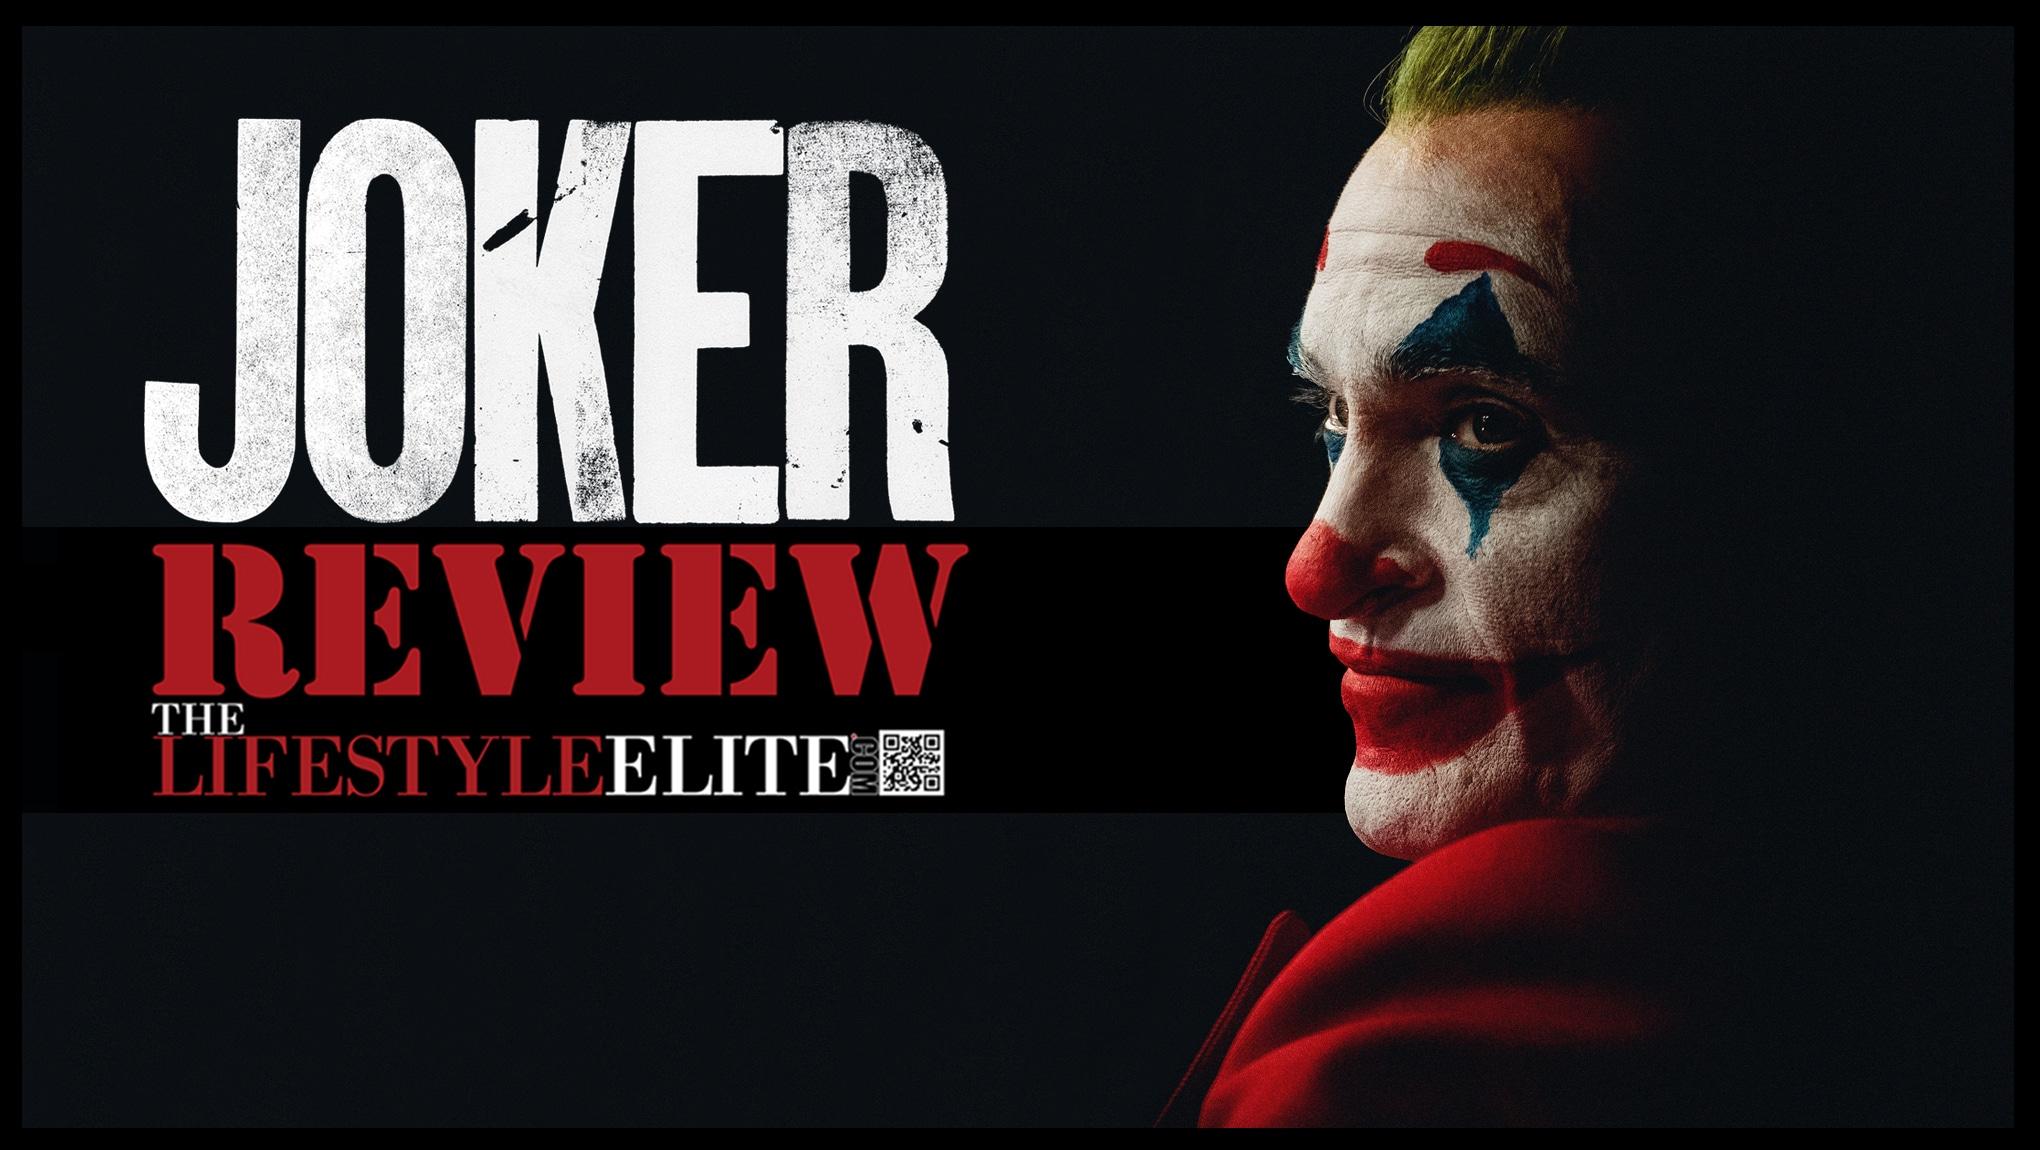 Joker, The Joker, The Joker Movie, The Joker Film, ThelifeStyleElite,TheLifeStyleelite.com,LifeStyleElite,DC, DC Comics,Batman,Antwaune Gray,Cheyan Gray,Batman,The Dark Knight